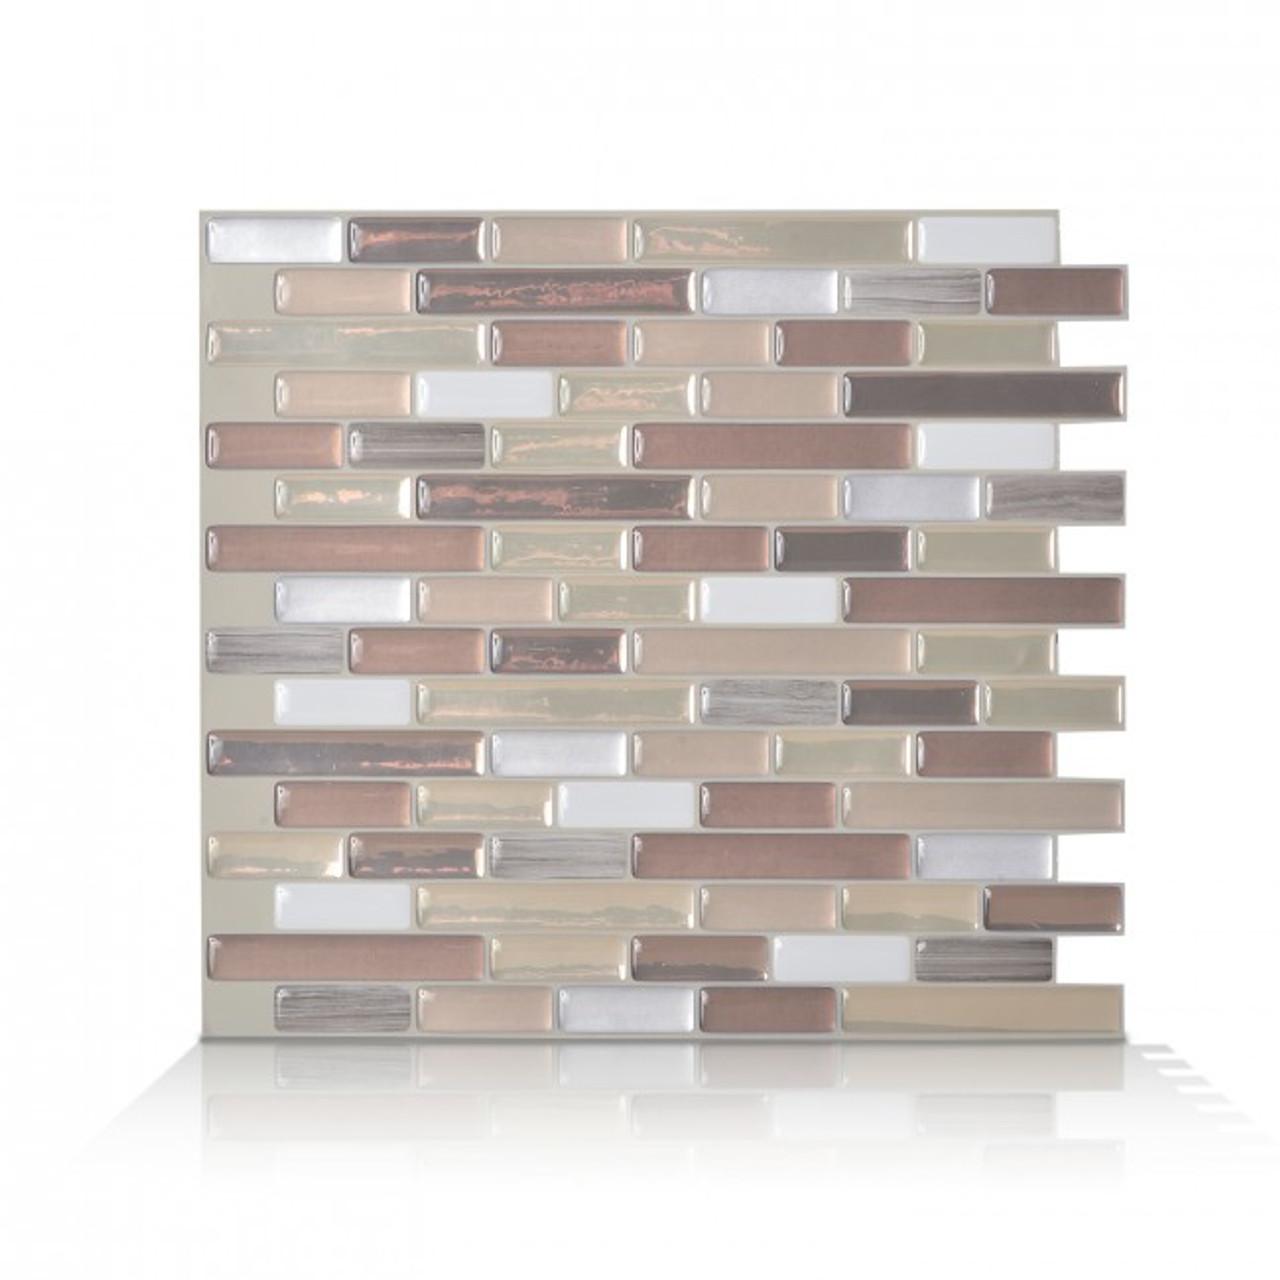 Muretto Durango Smart Tile   Single Piece   SM1053-1